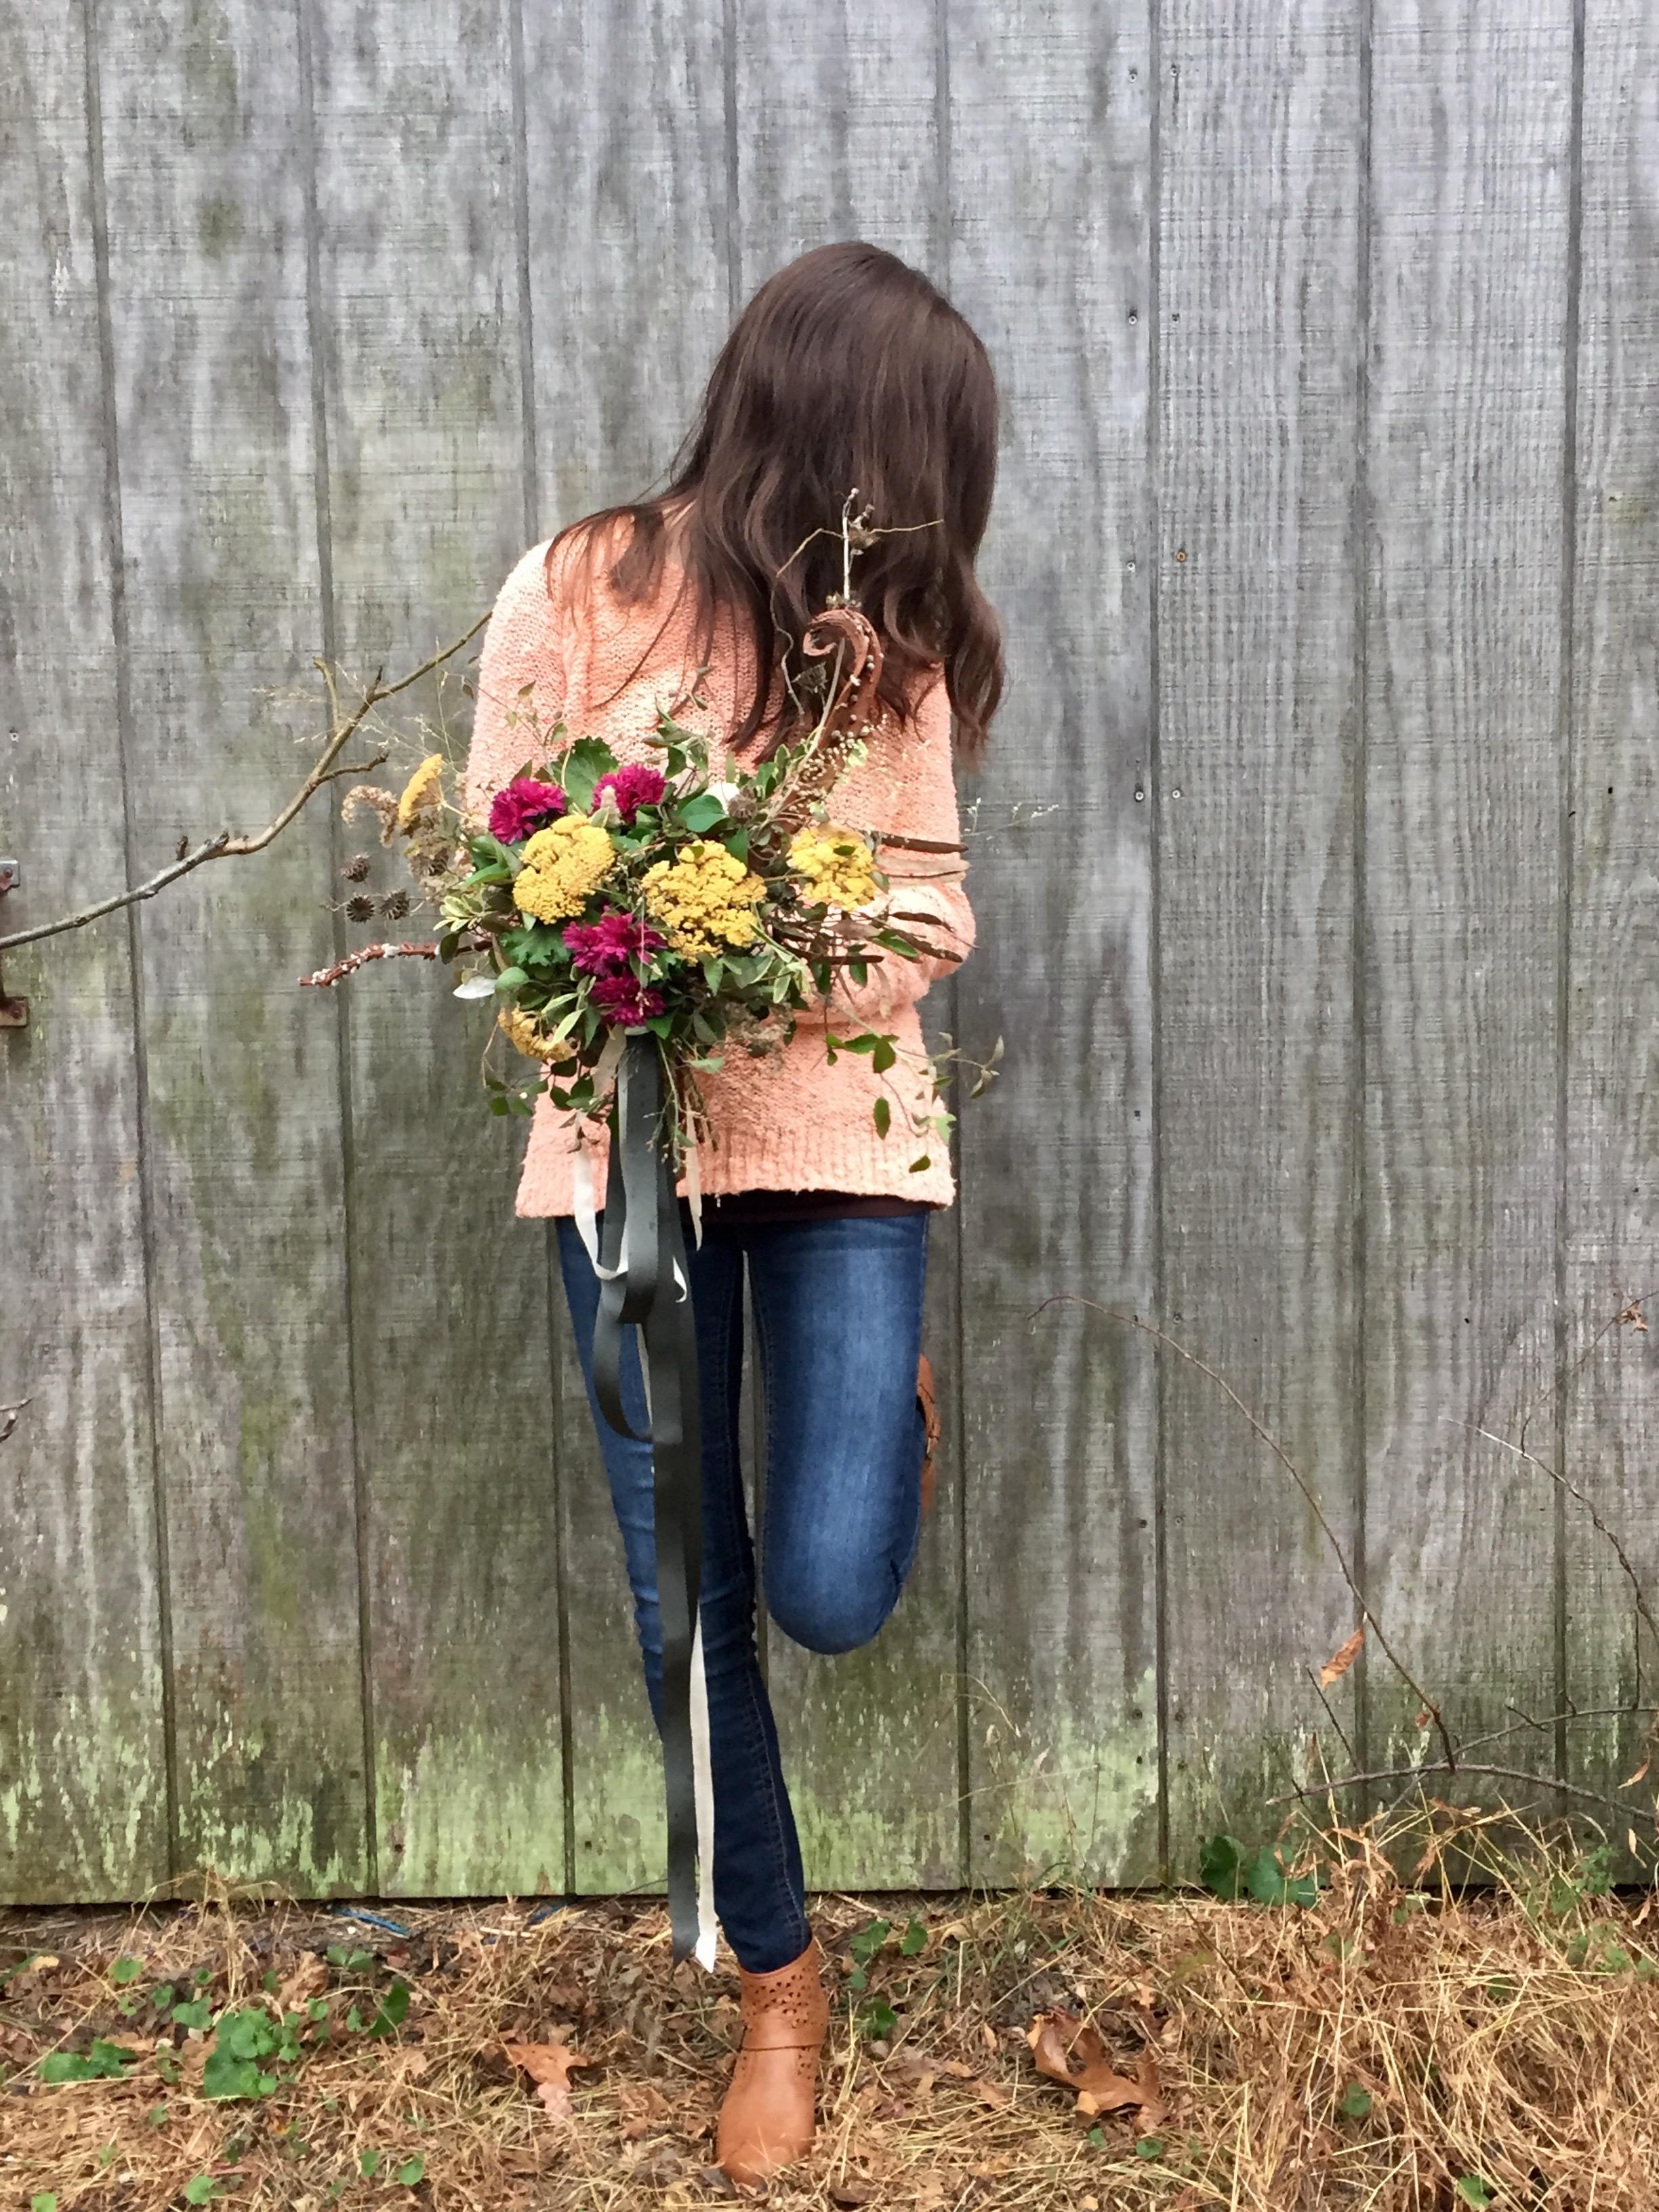 Bouquet Photo Nov 24, 3 46 34 PM.jpg